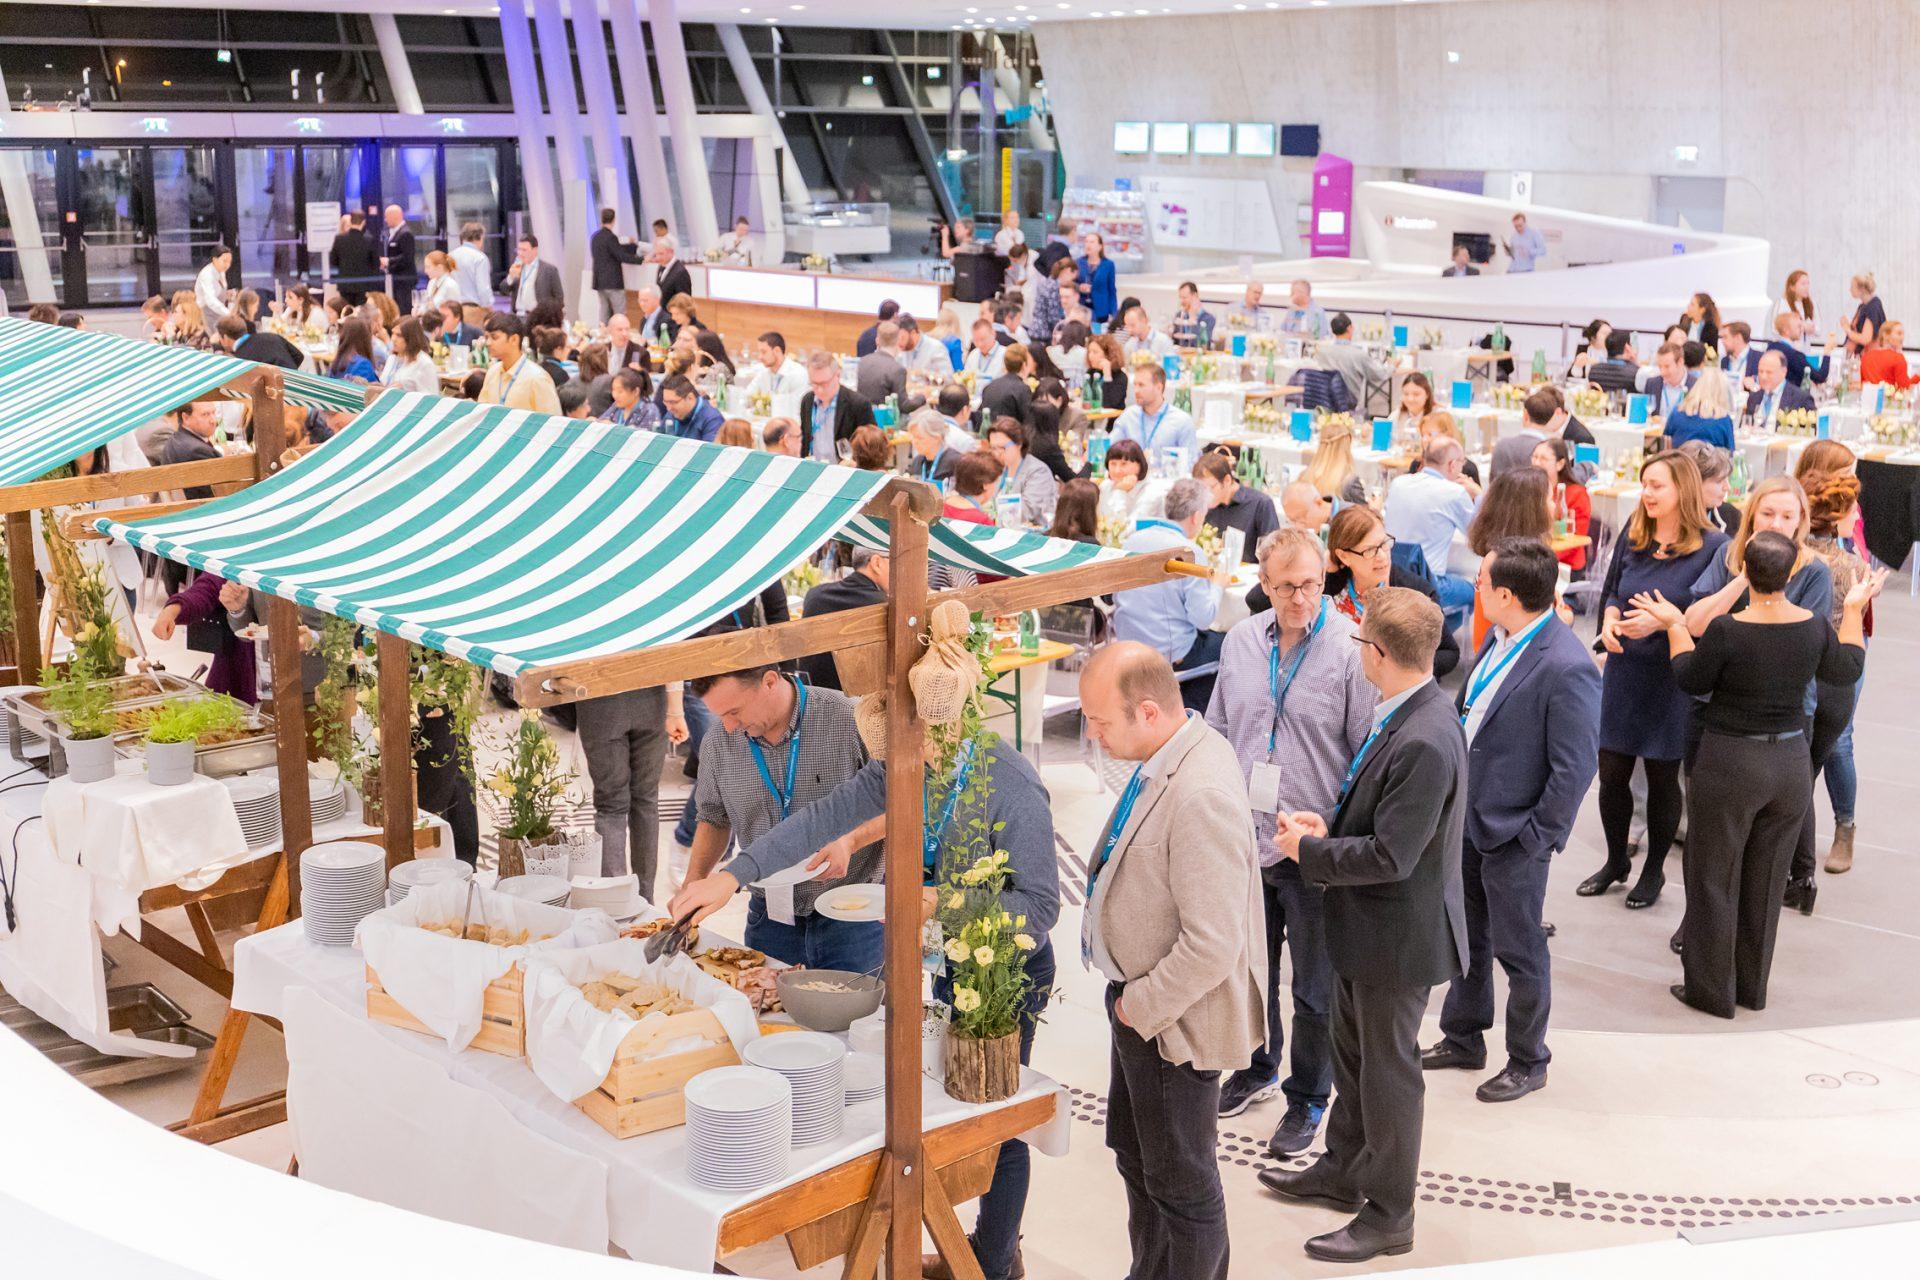 6H5A5915_20191128_CEMS_ANNUAL_EVENTS_2019_VIENNA